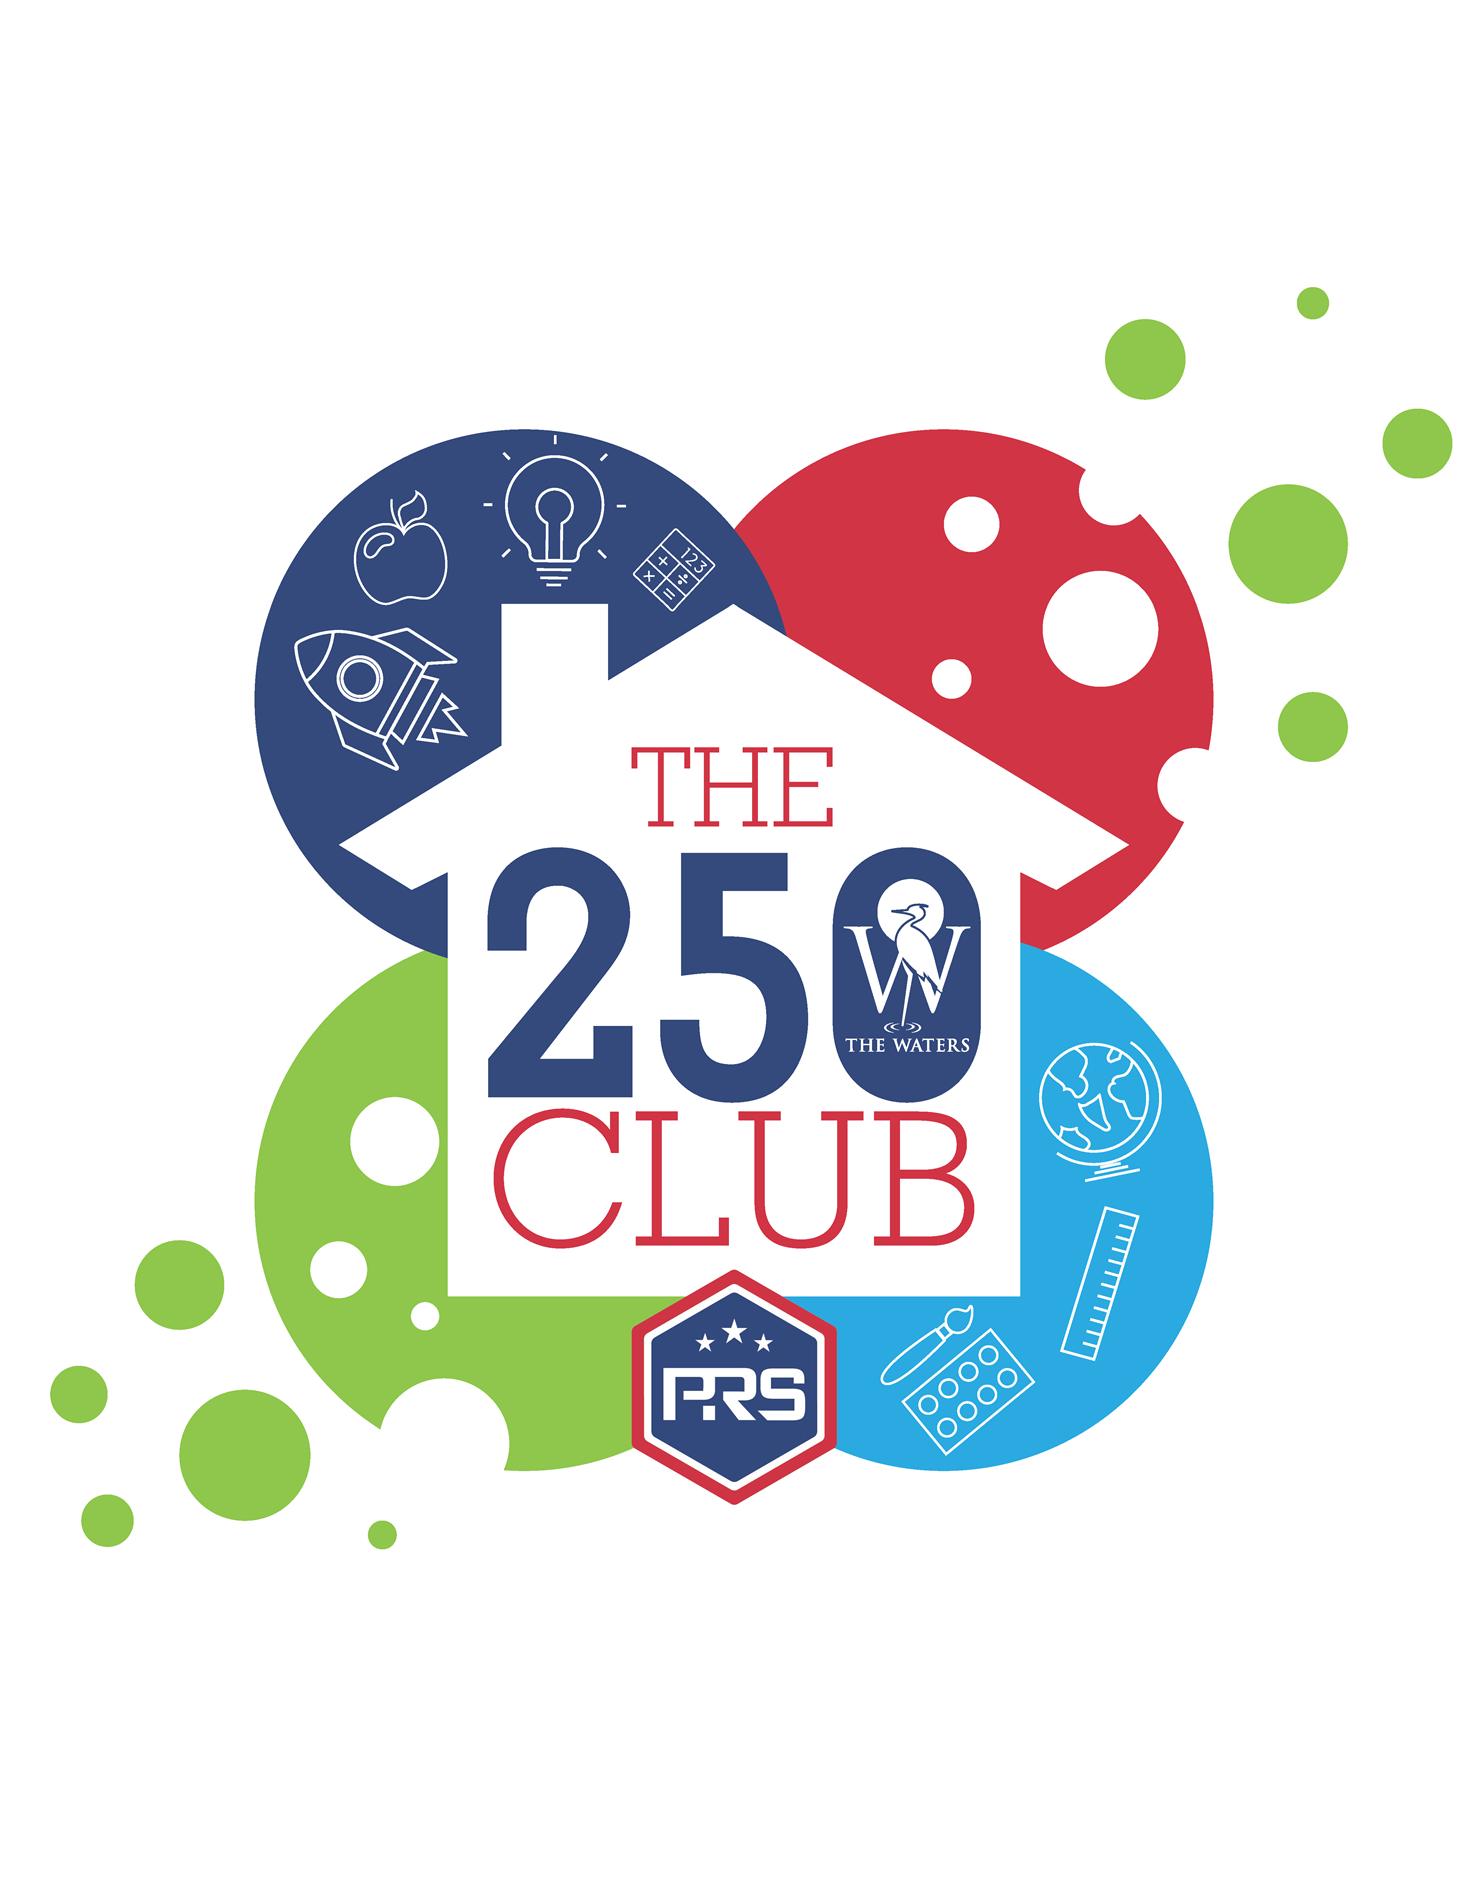 The 250 Club